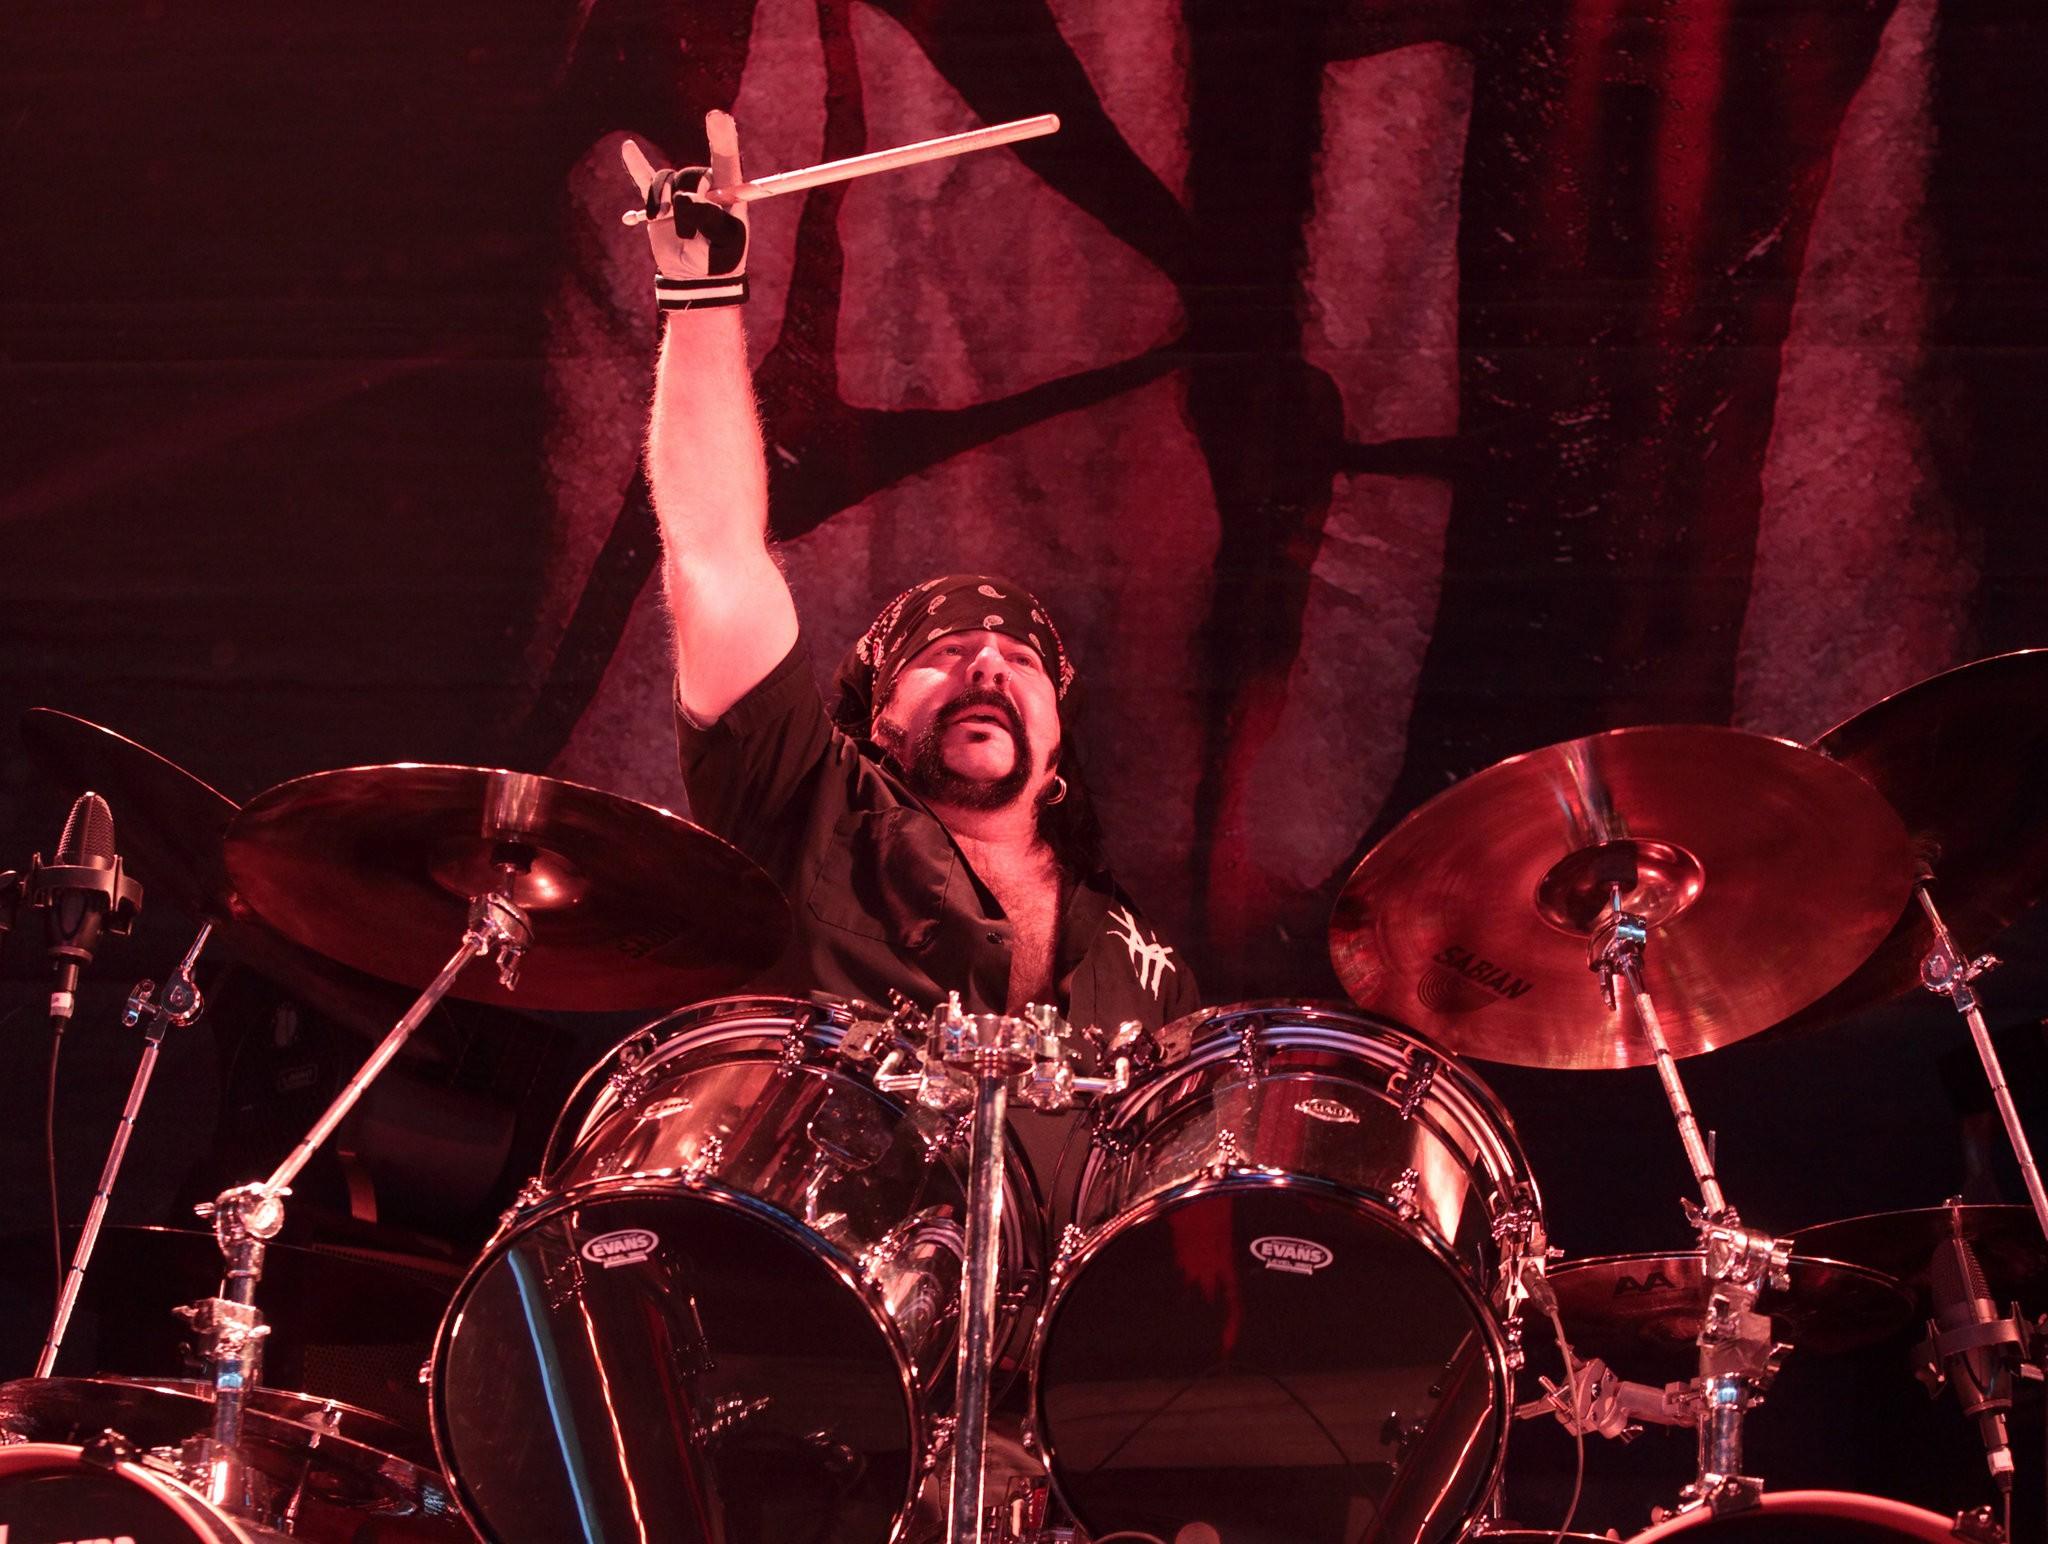 Vinnie Paul, Pantera Drummer and Heavy Metal Innovator, Is Dead at 54